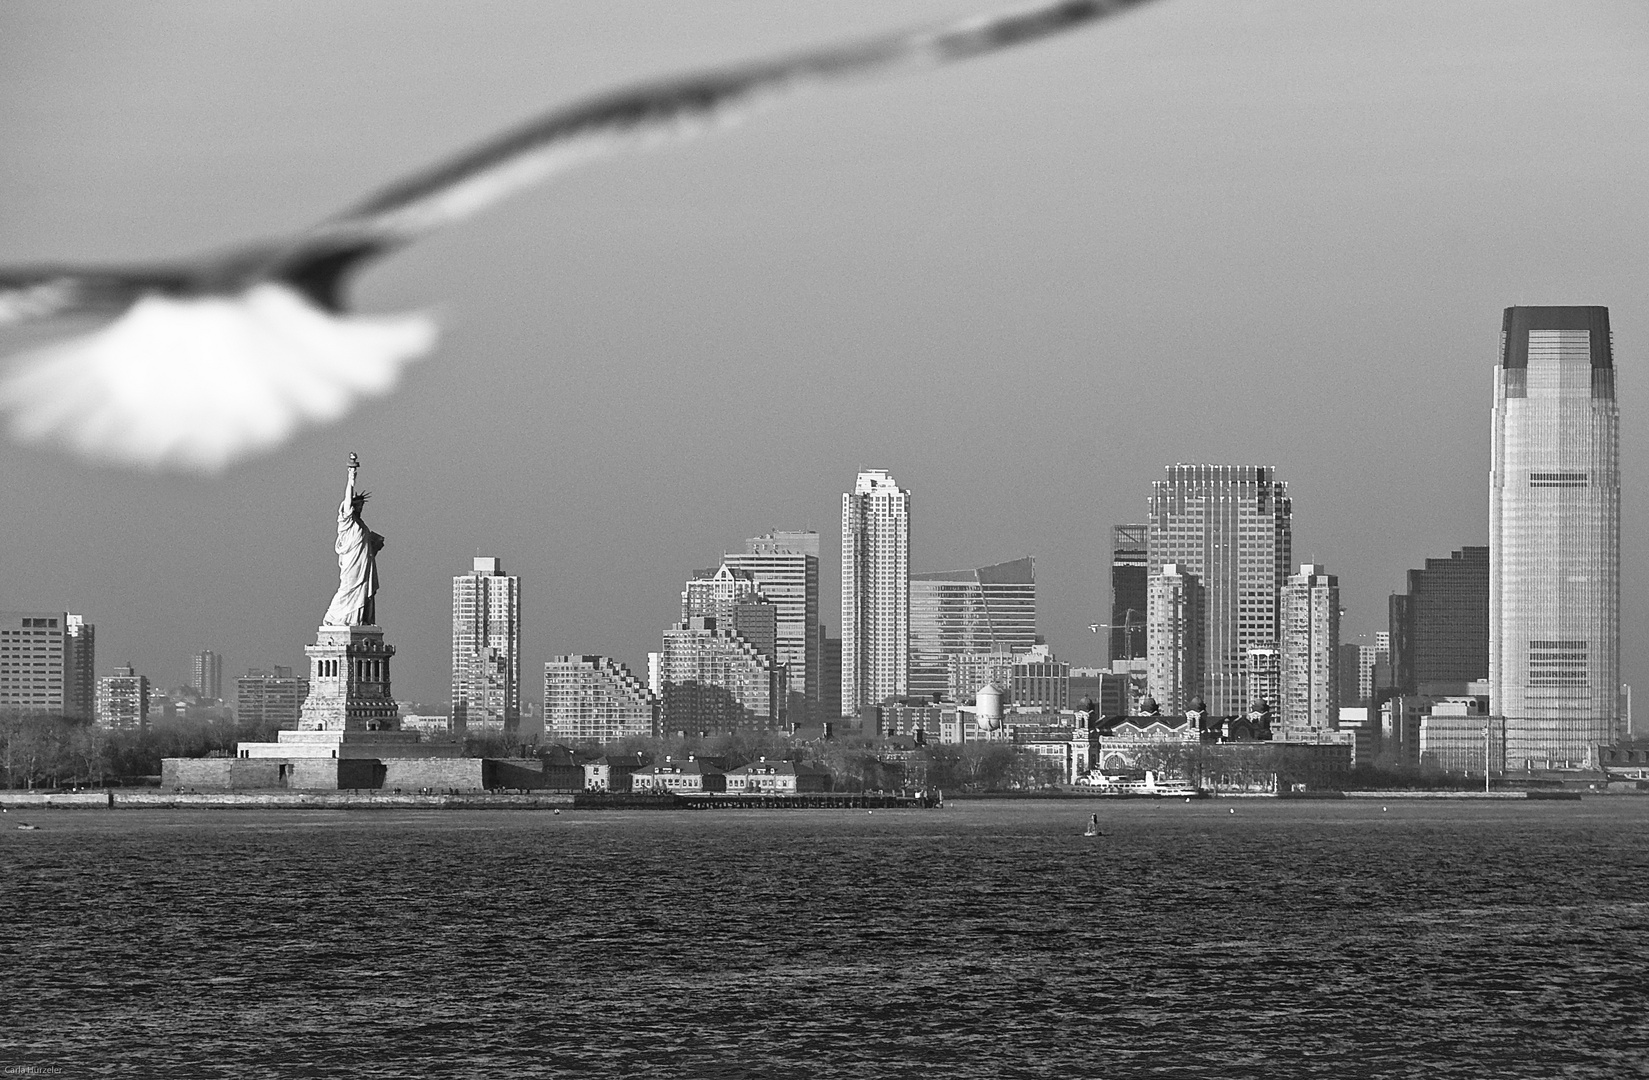 Skyline with Lady Liberty